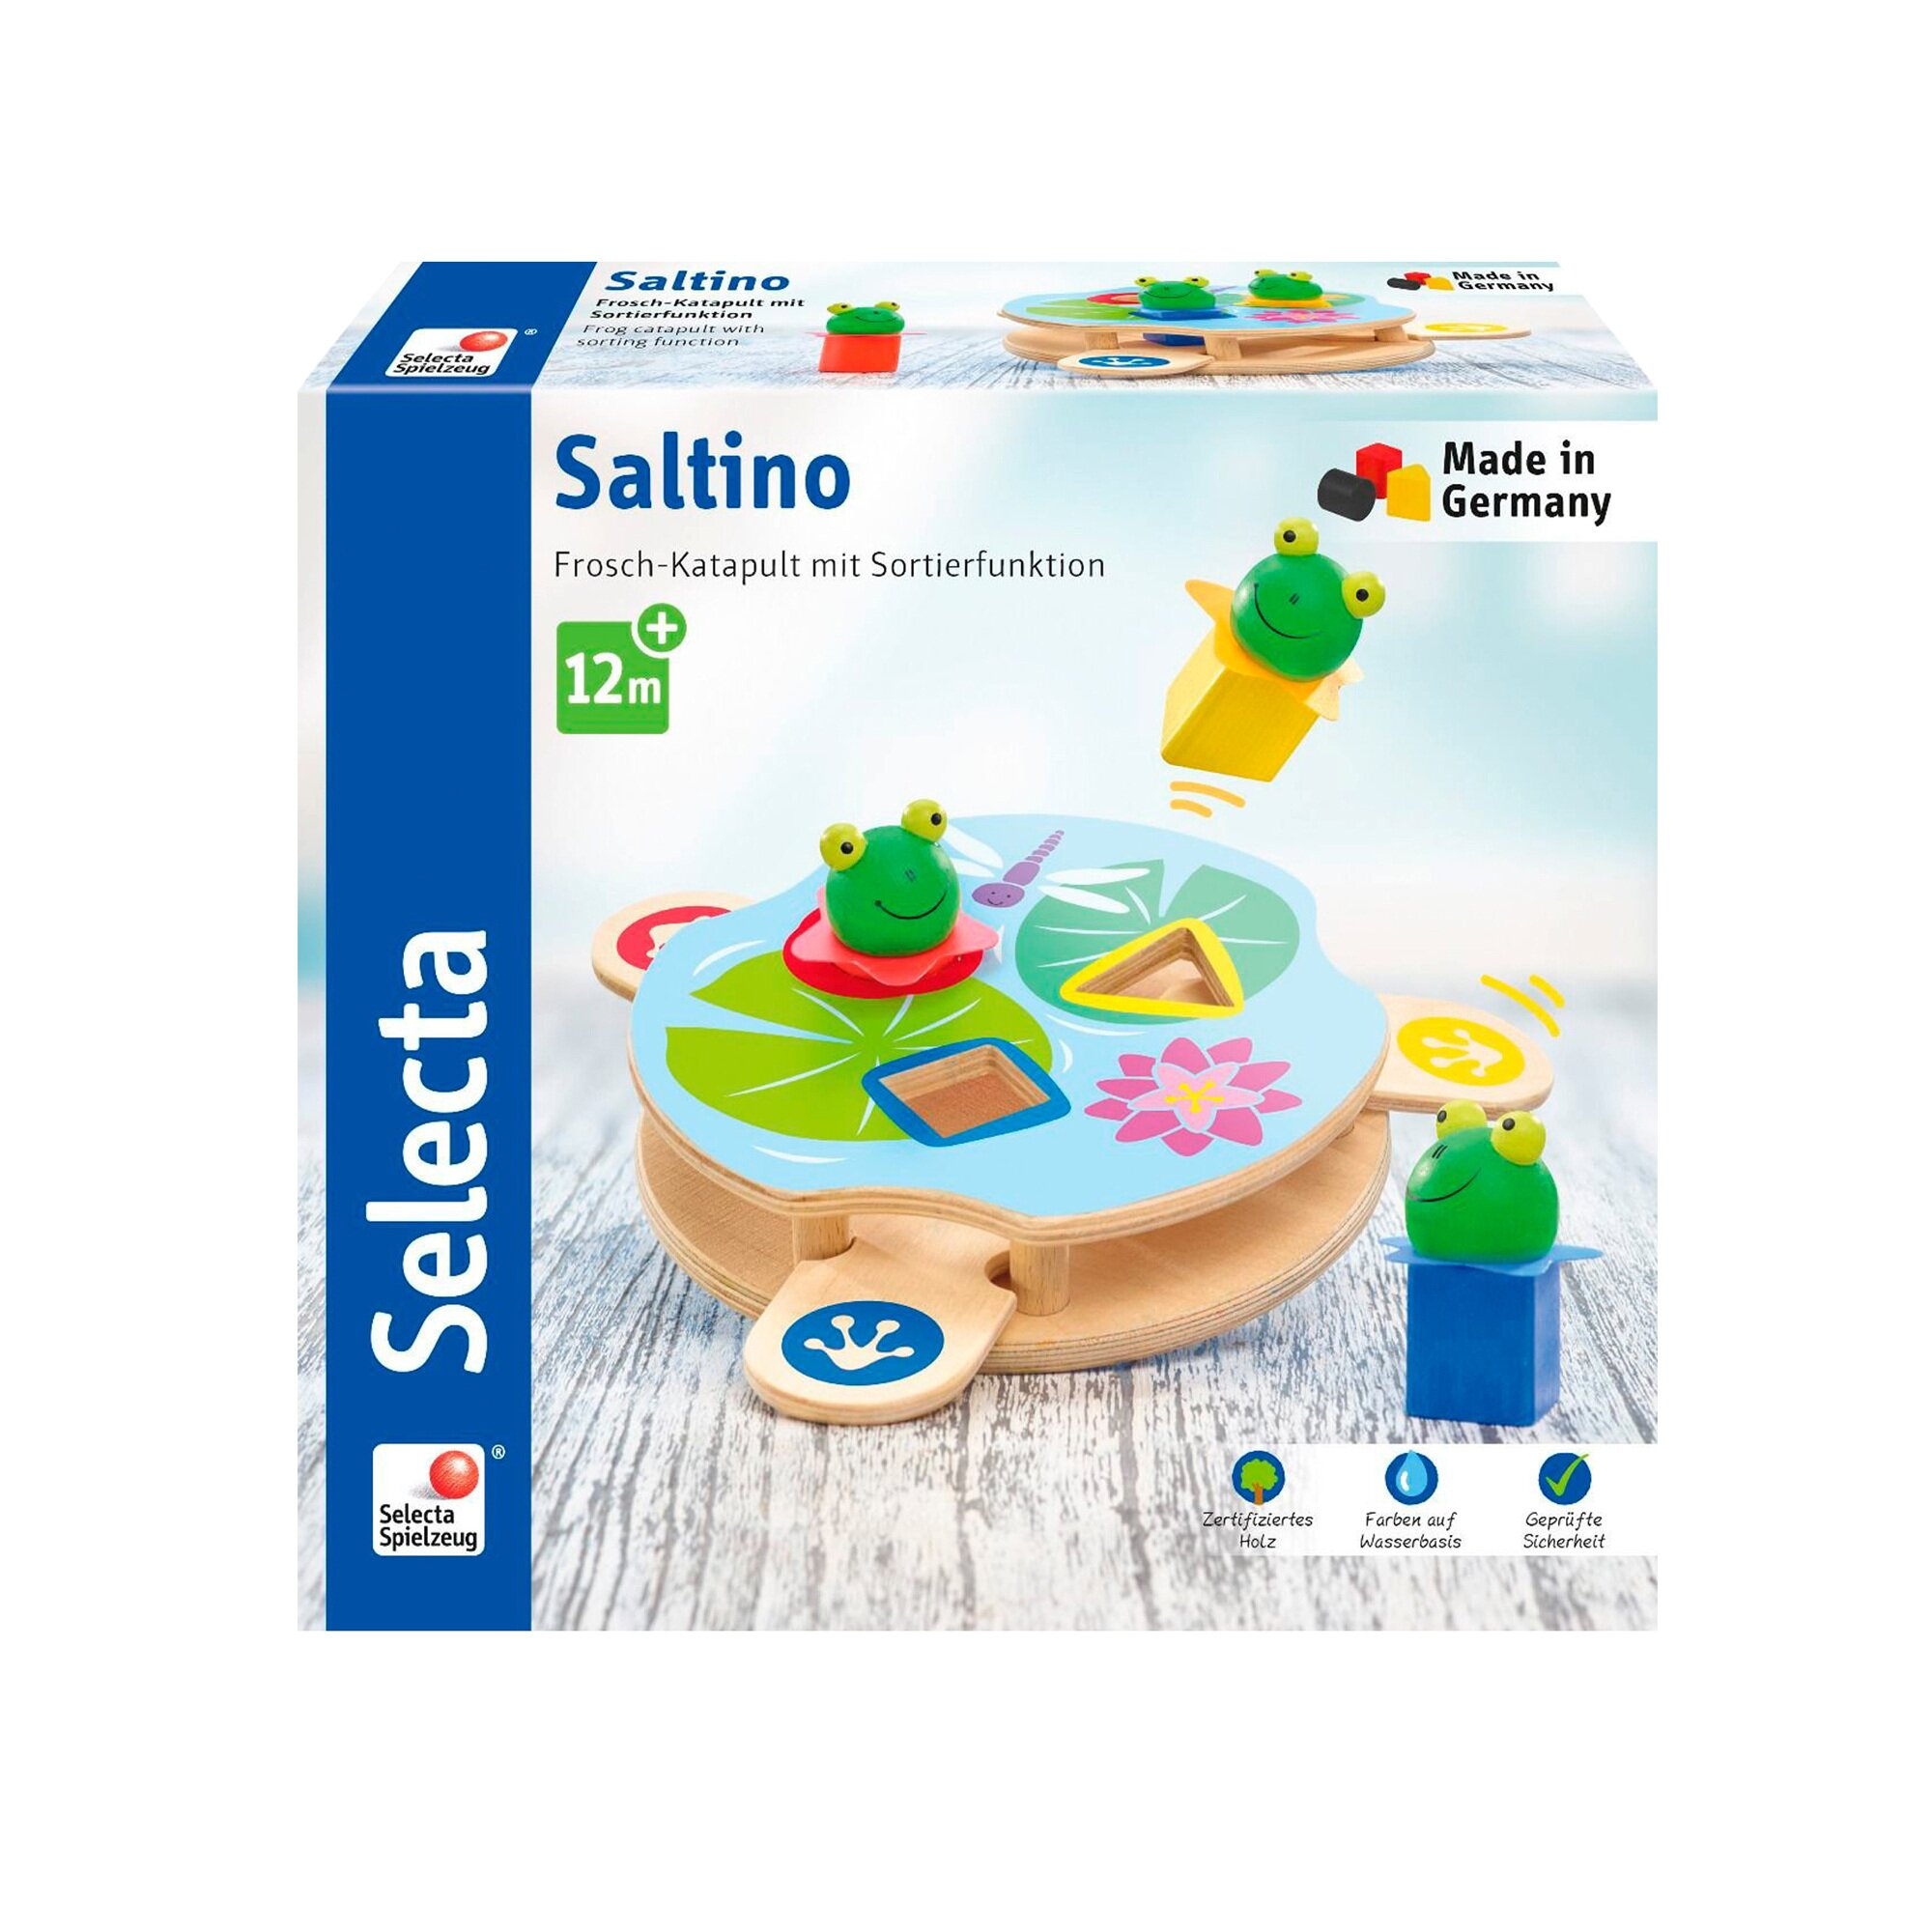 selecta-steckspiel-saltino-frosch-katapult-aus-holz